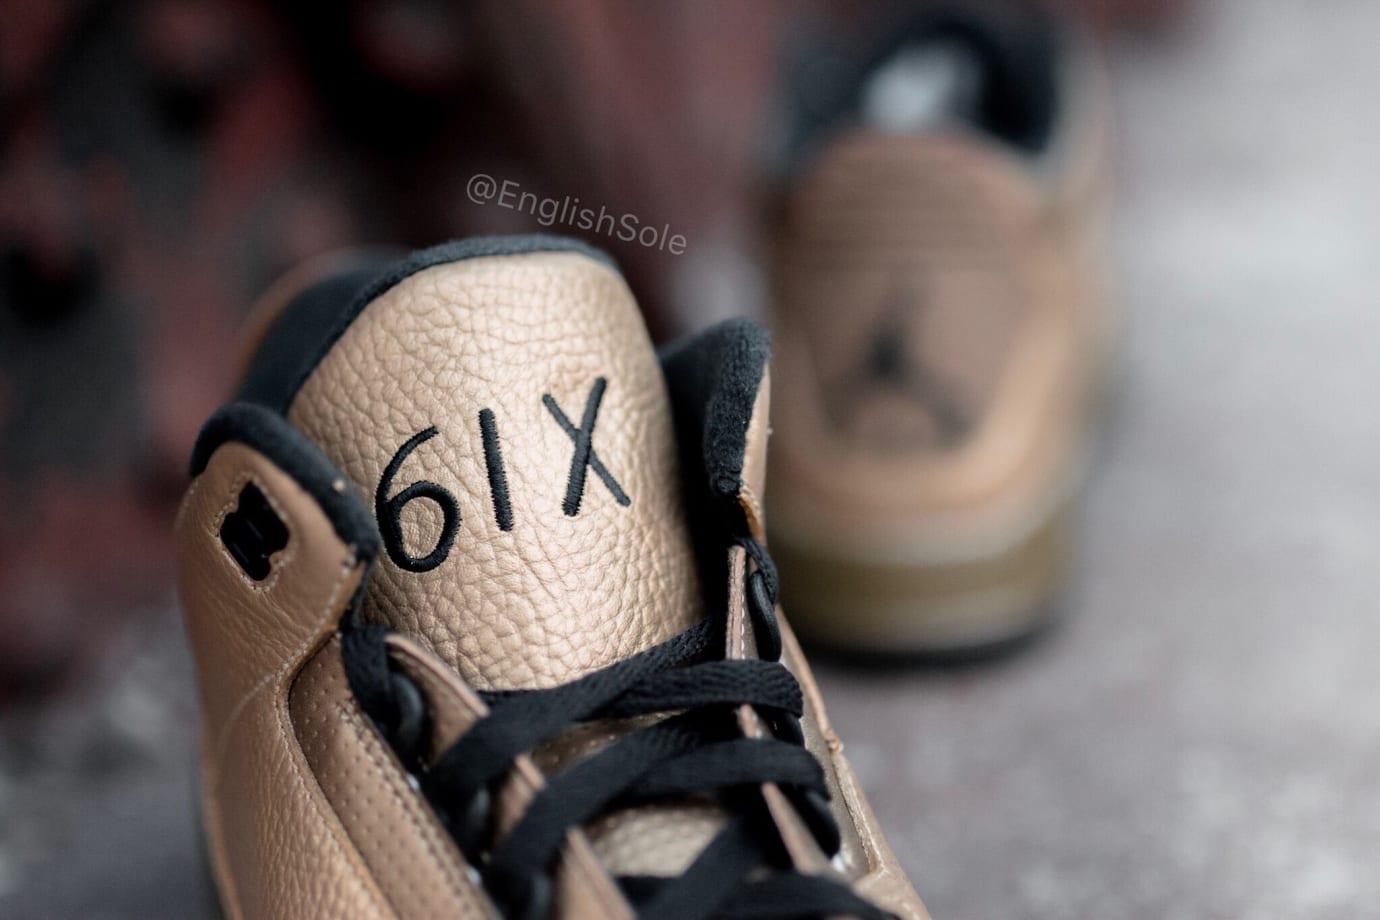 866d673d35b972 Image via  englishsole · OVO x Air Jordan 3  6ix  (Tongue)